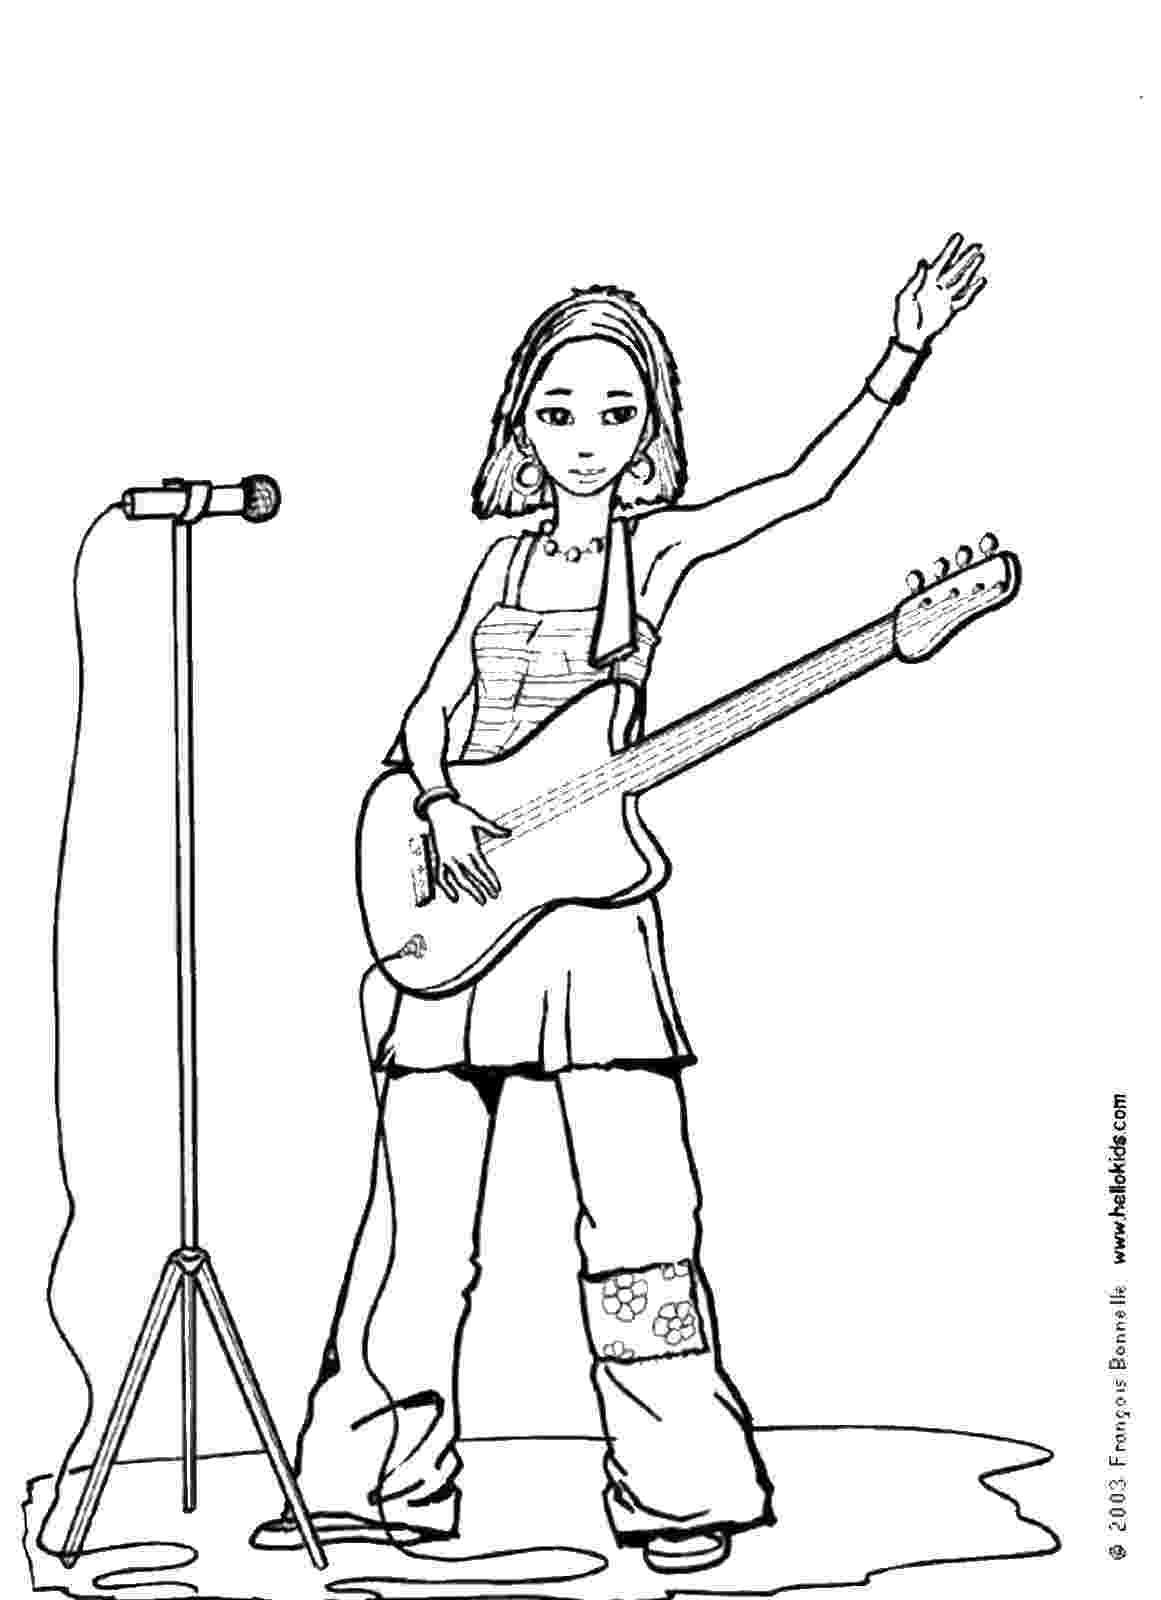 rock star coloring pages rock star coloring pages star coloring pages rock